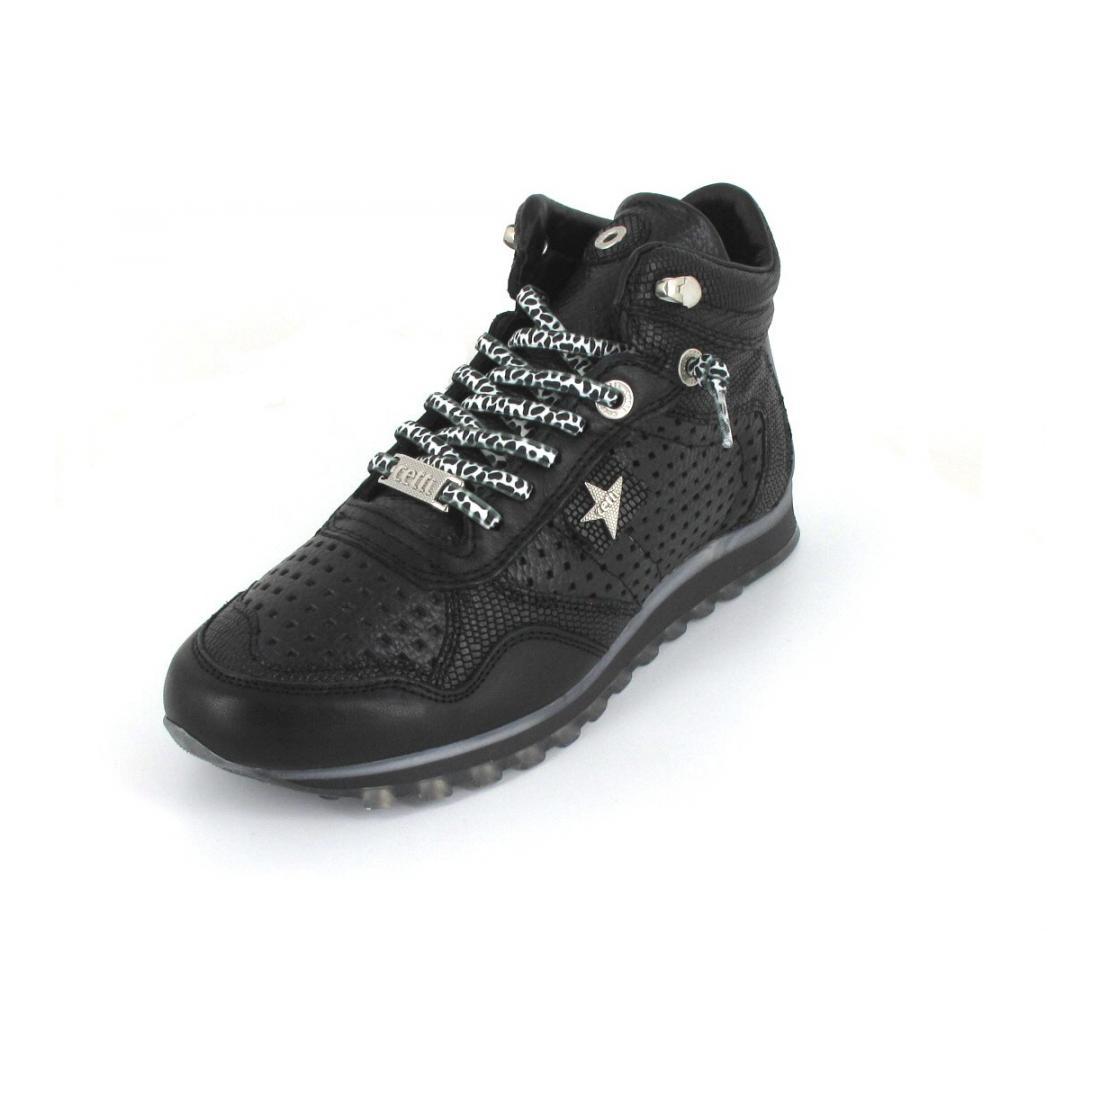 Cetti Sneaker high sweet all black